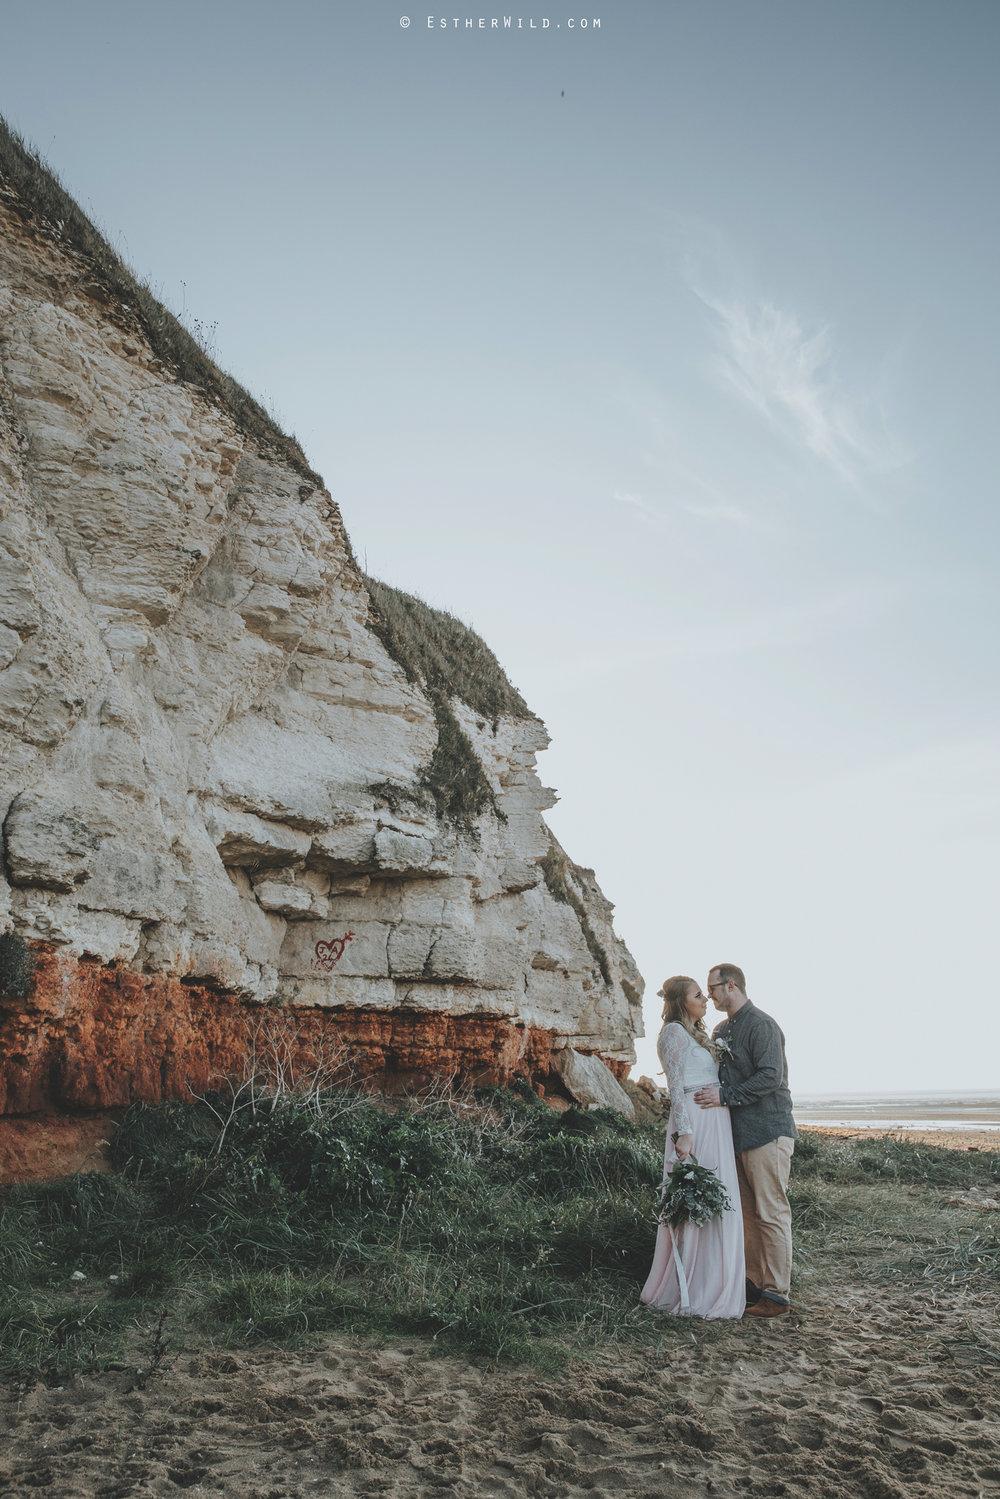 Couple_Anniversary_Wedding_Photography_Hunstanton_Norfolk_Esther_Wild_Share_Copy_IMG_8641.jpg